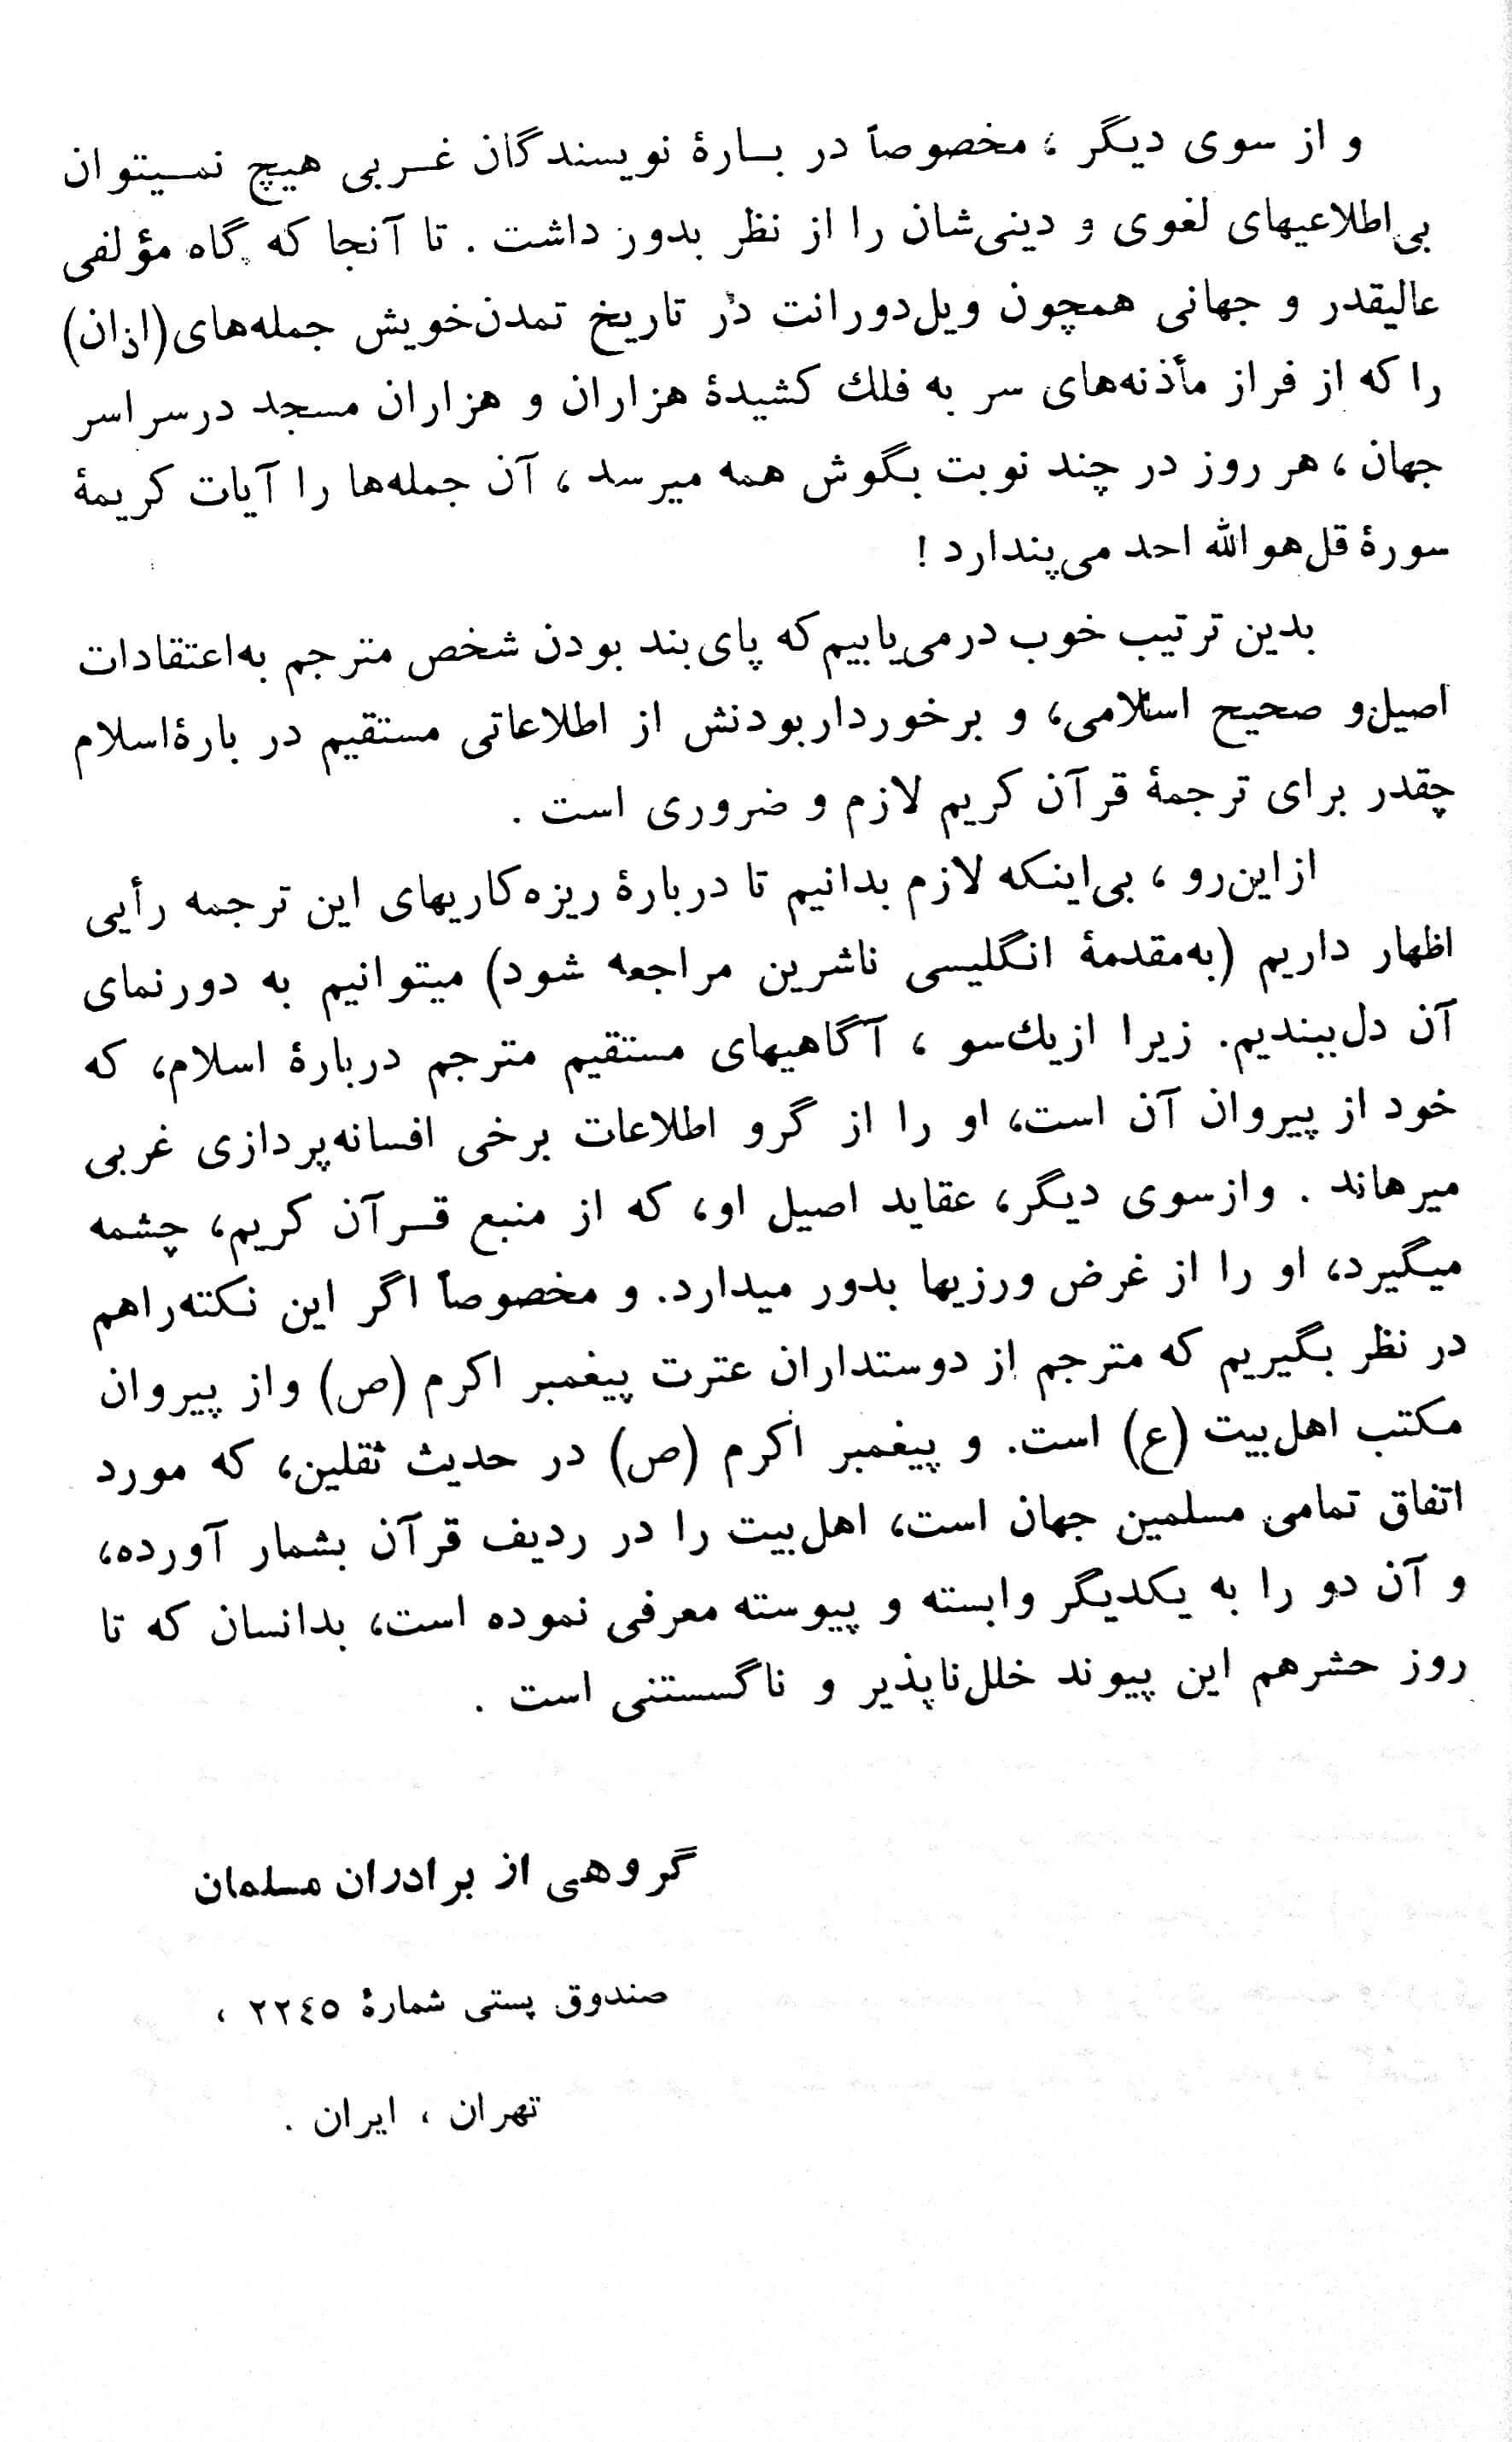 M. H. Shakir 1974 Quran Explorer, Page 3